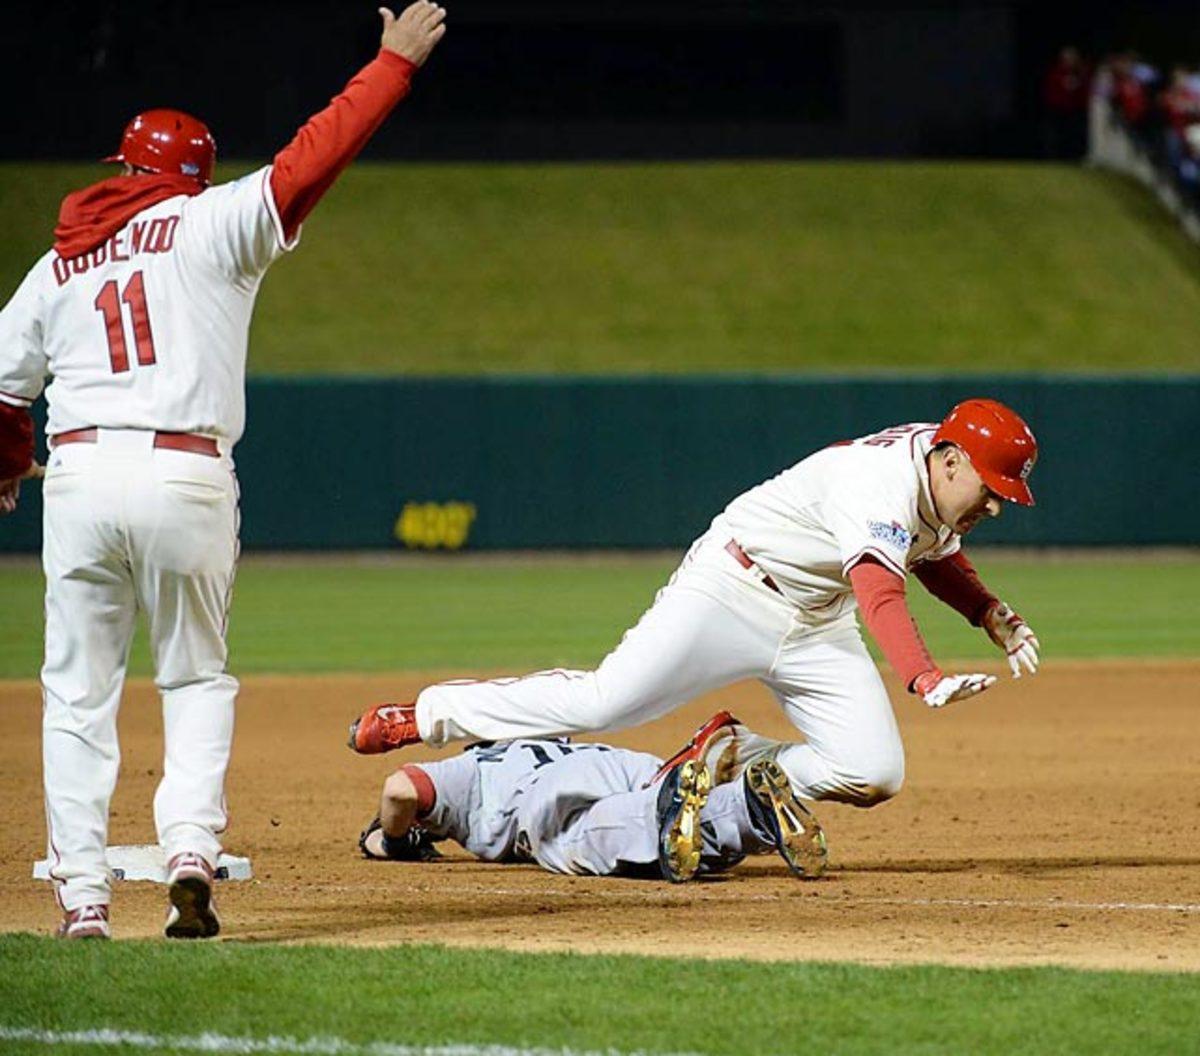 Cardinals 5, Red Sox 4